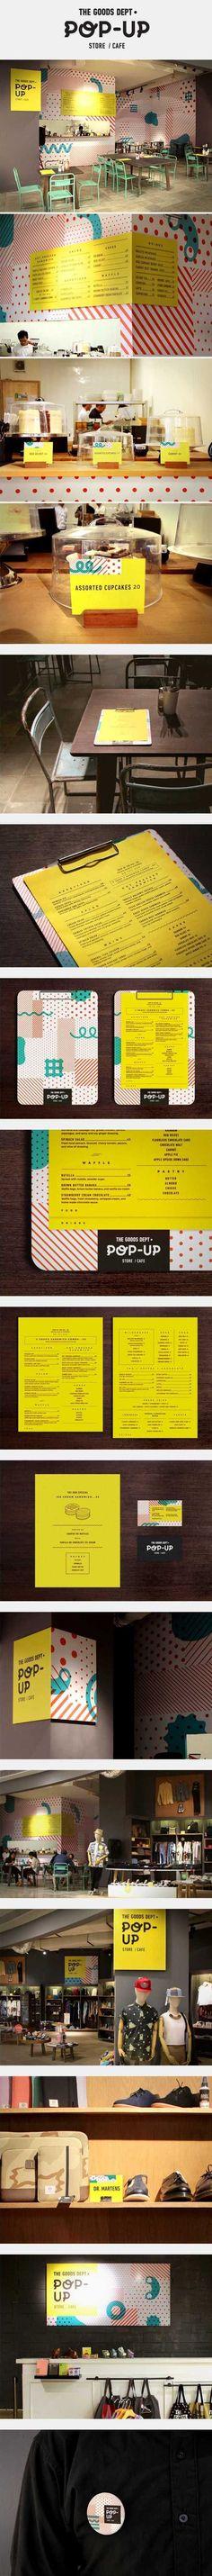 The Goods Dept Pop-Up Store/Cafe on Behance